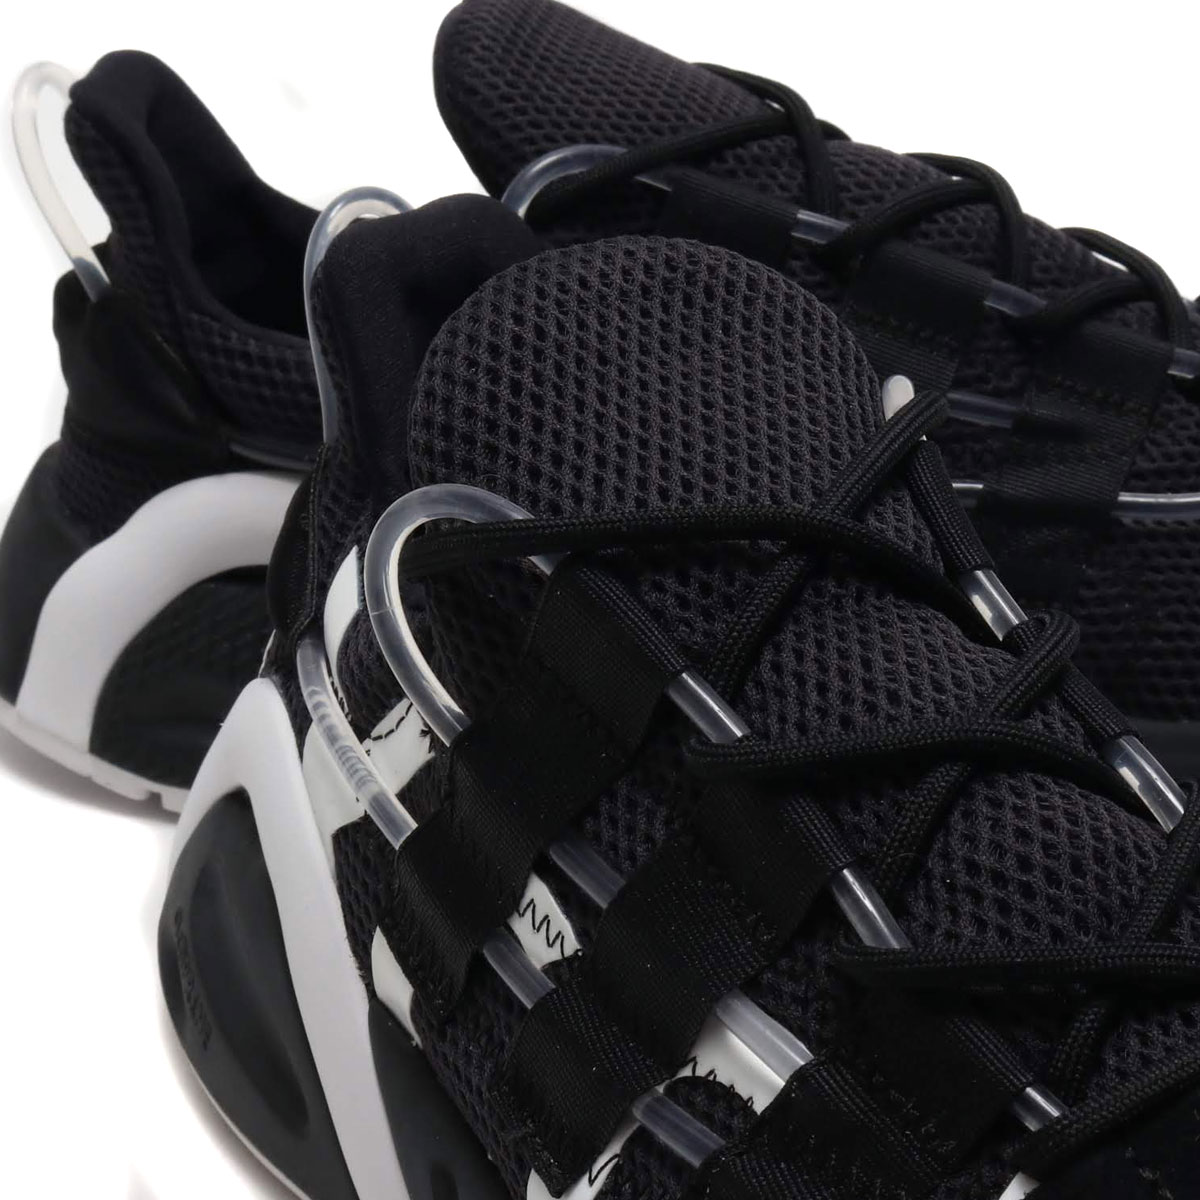 adidas LXCON アディダス レキシコン CORE BLACK CORE BLACK BRIGHT CYAN メンズ レディース スニーカー 19SS SUzMVjLqSpG